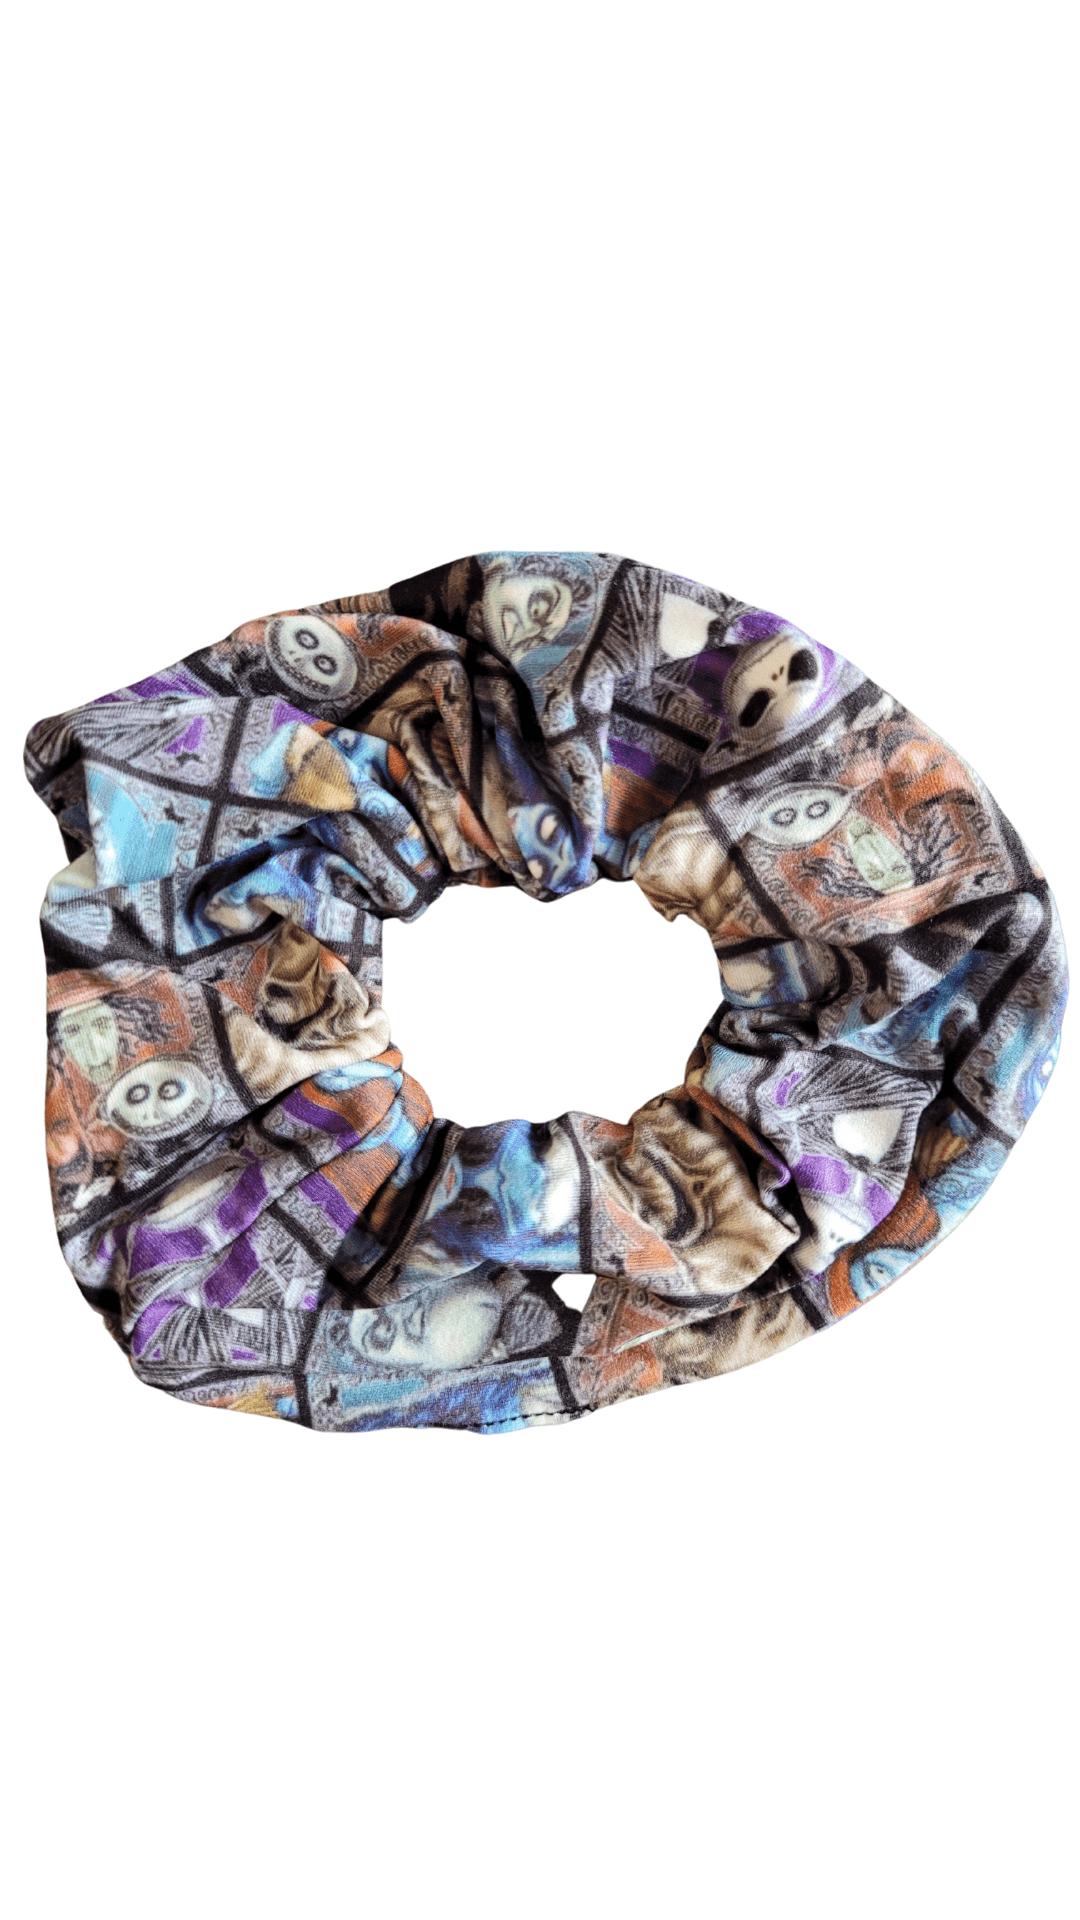 Nightmare Mosaic Printed Scrunchie